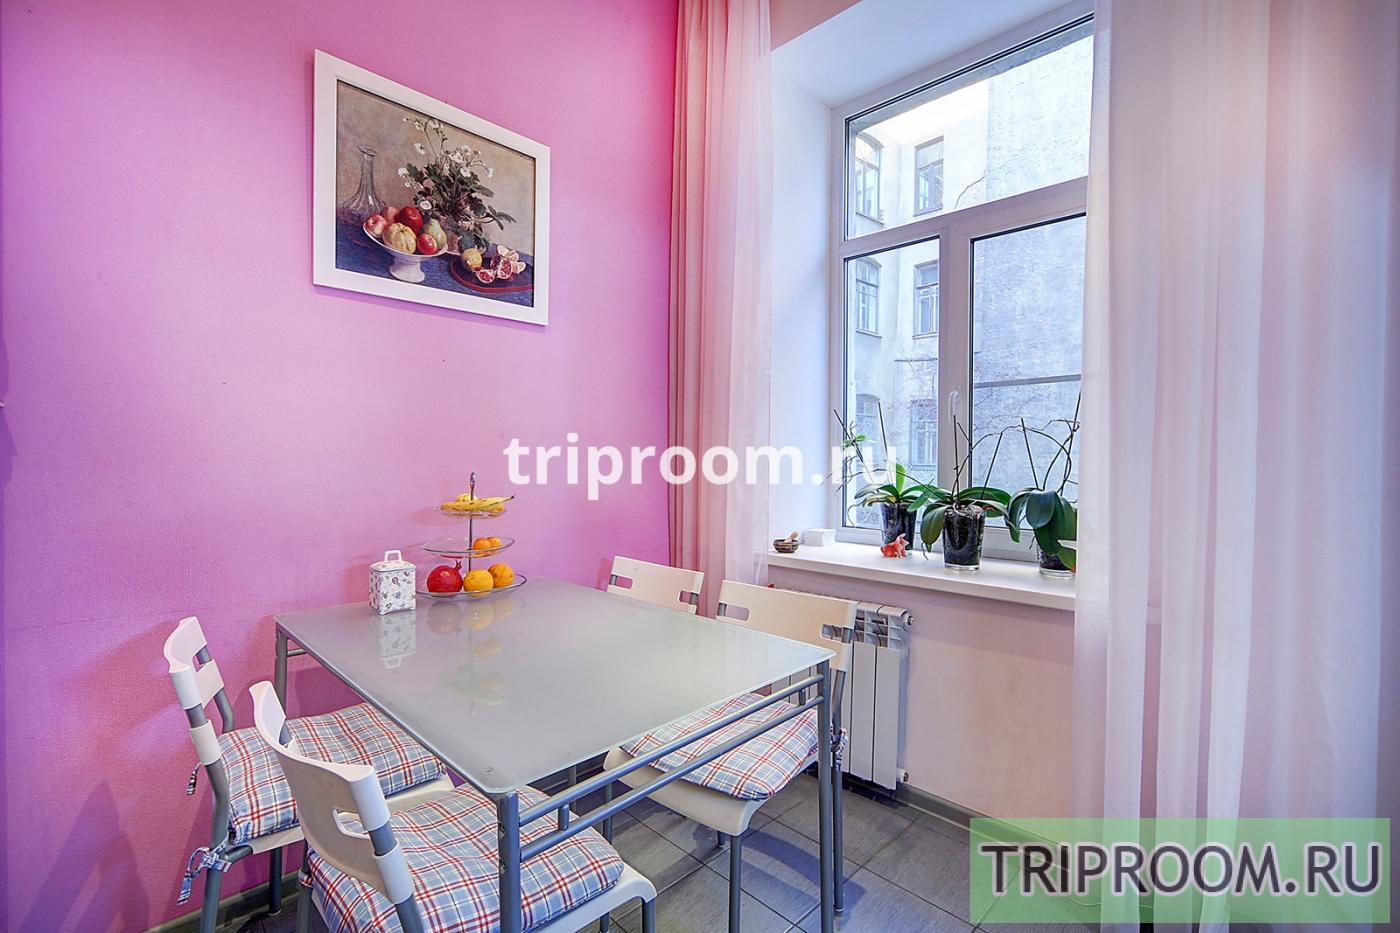 2-комнатная квартира посуточно (вариант № 15426), ул. Лиговский проспект, фото № 22